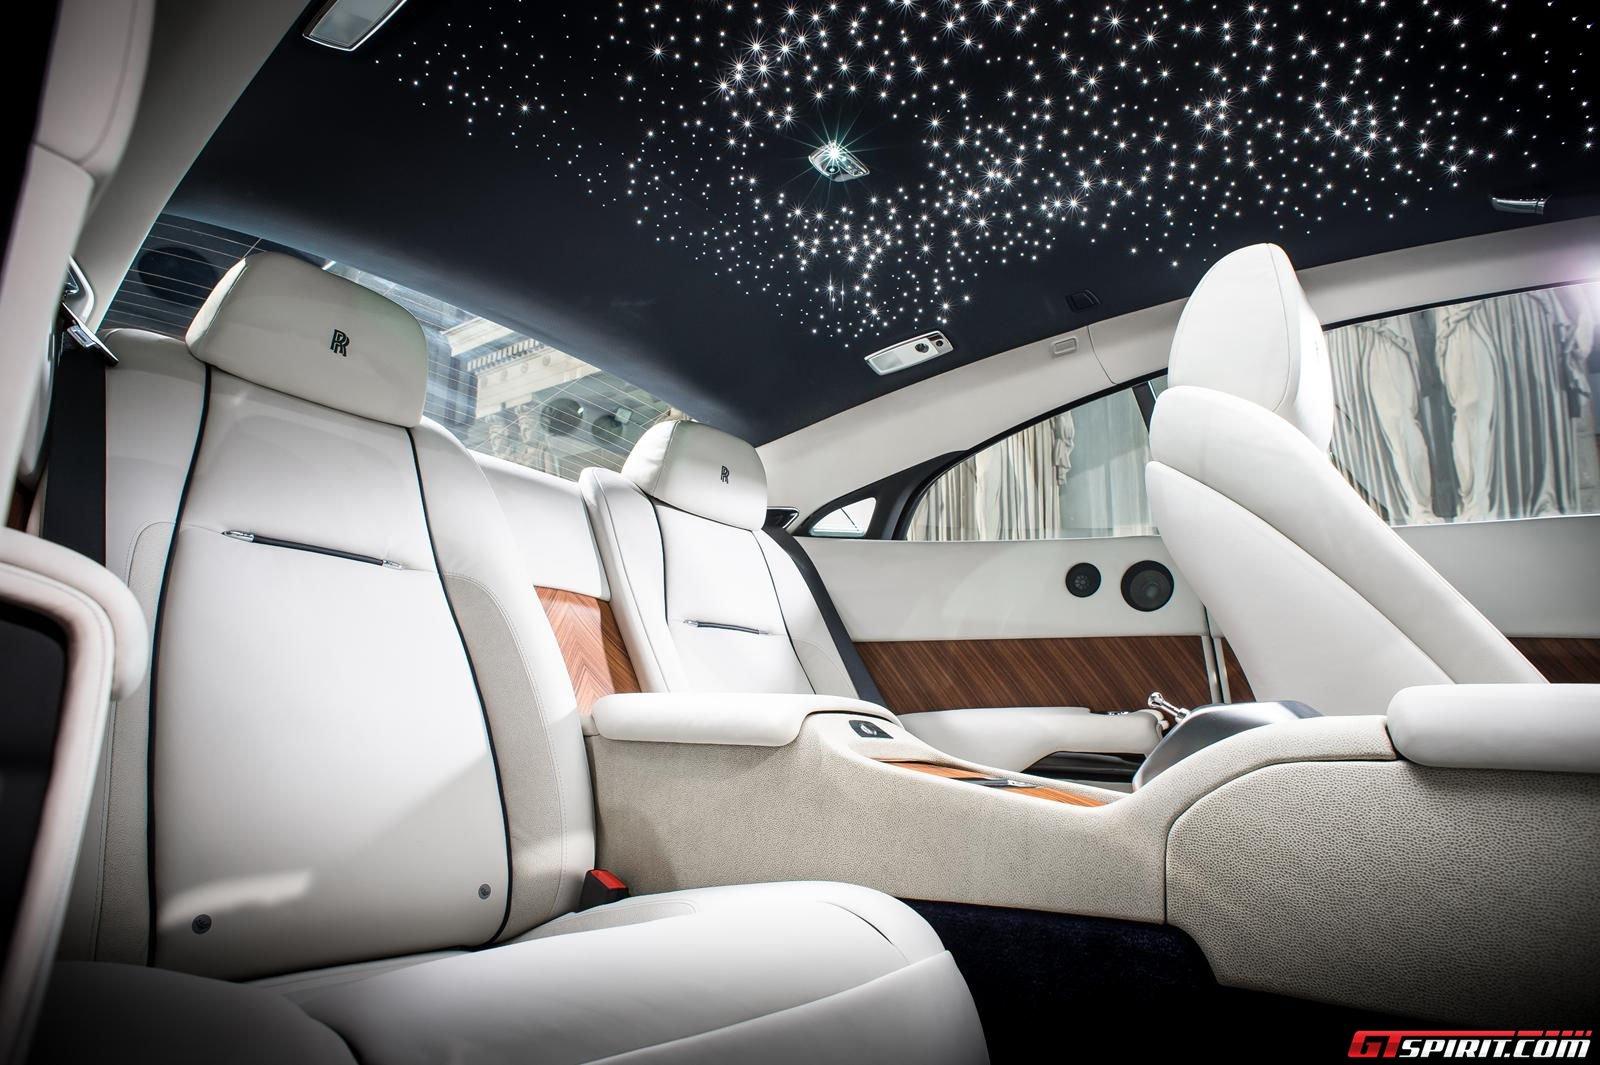 rolls royce 2015 wraith interior. royce wraith interior image rolls 2015